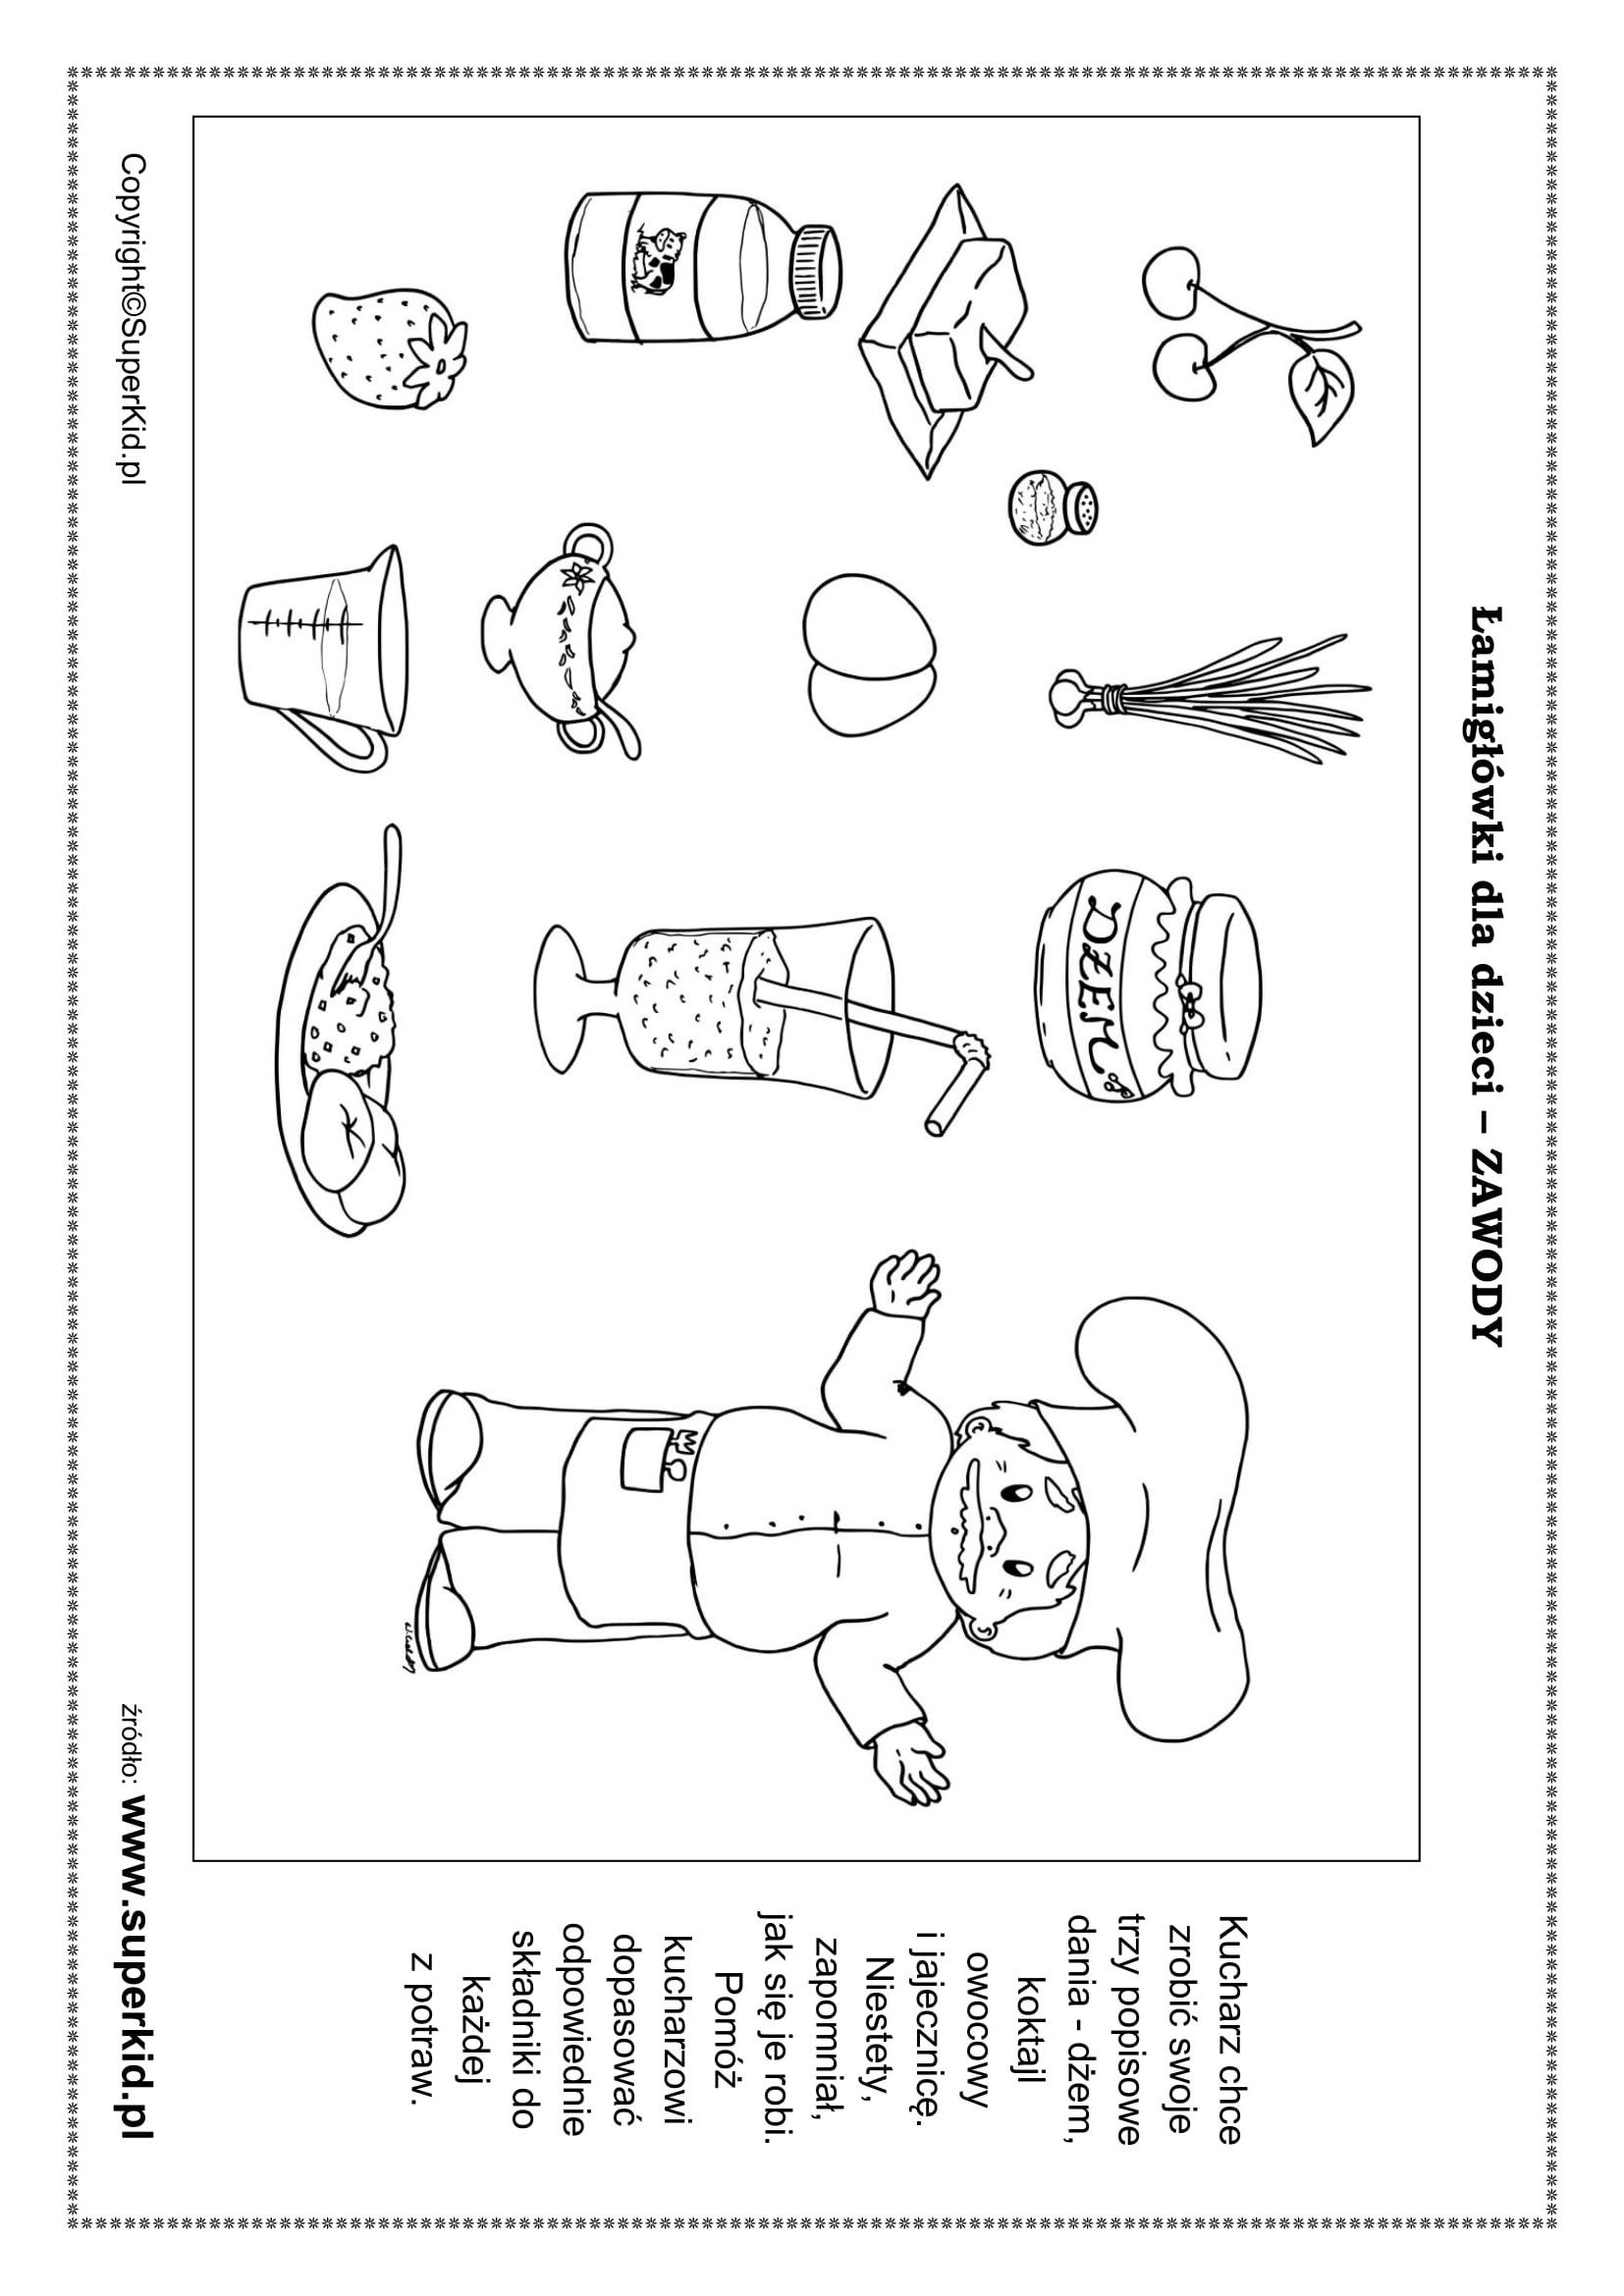 Pin By Gocha On Gocha In 2020 Coloring Pages Kindergarten Education